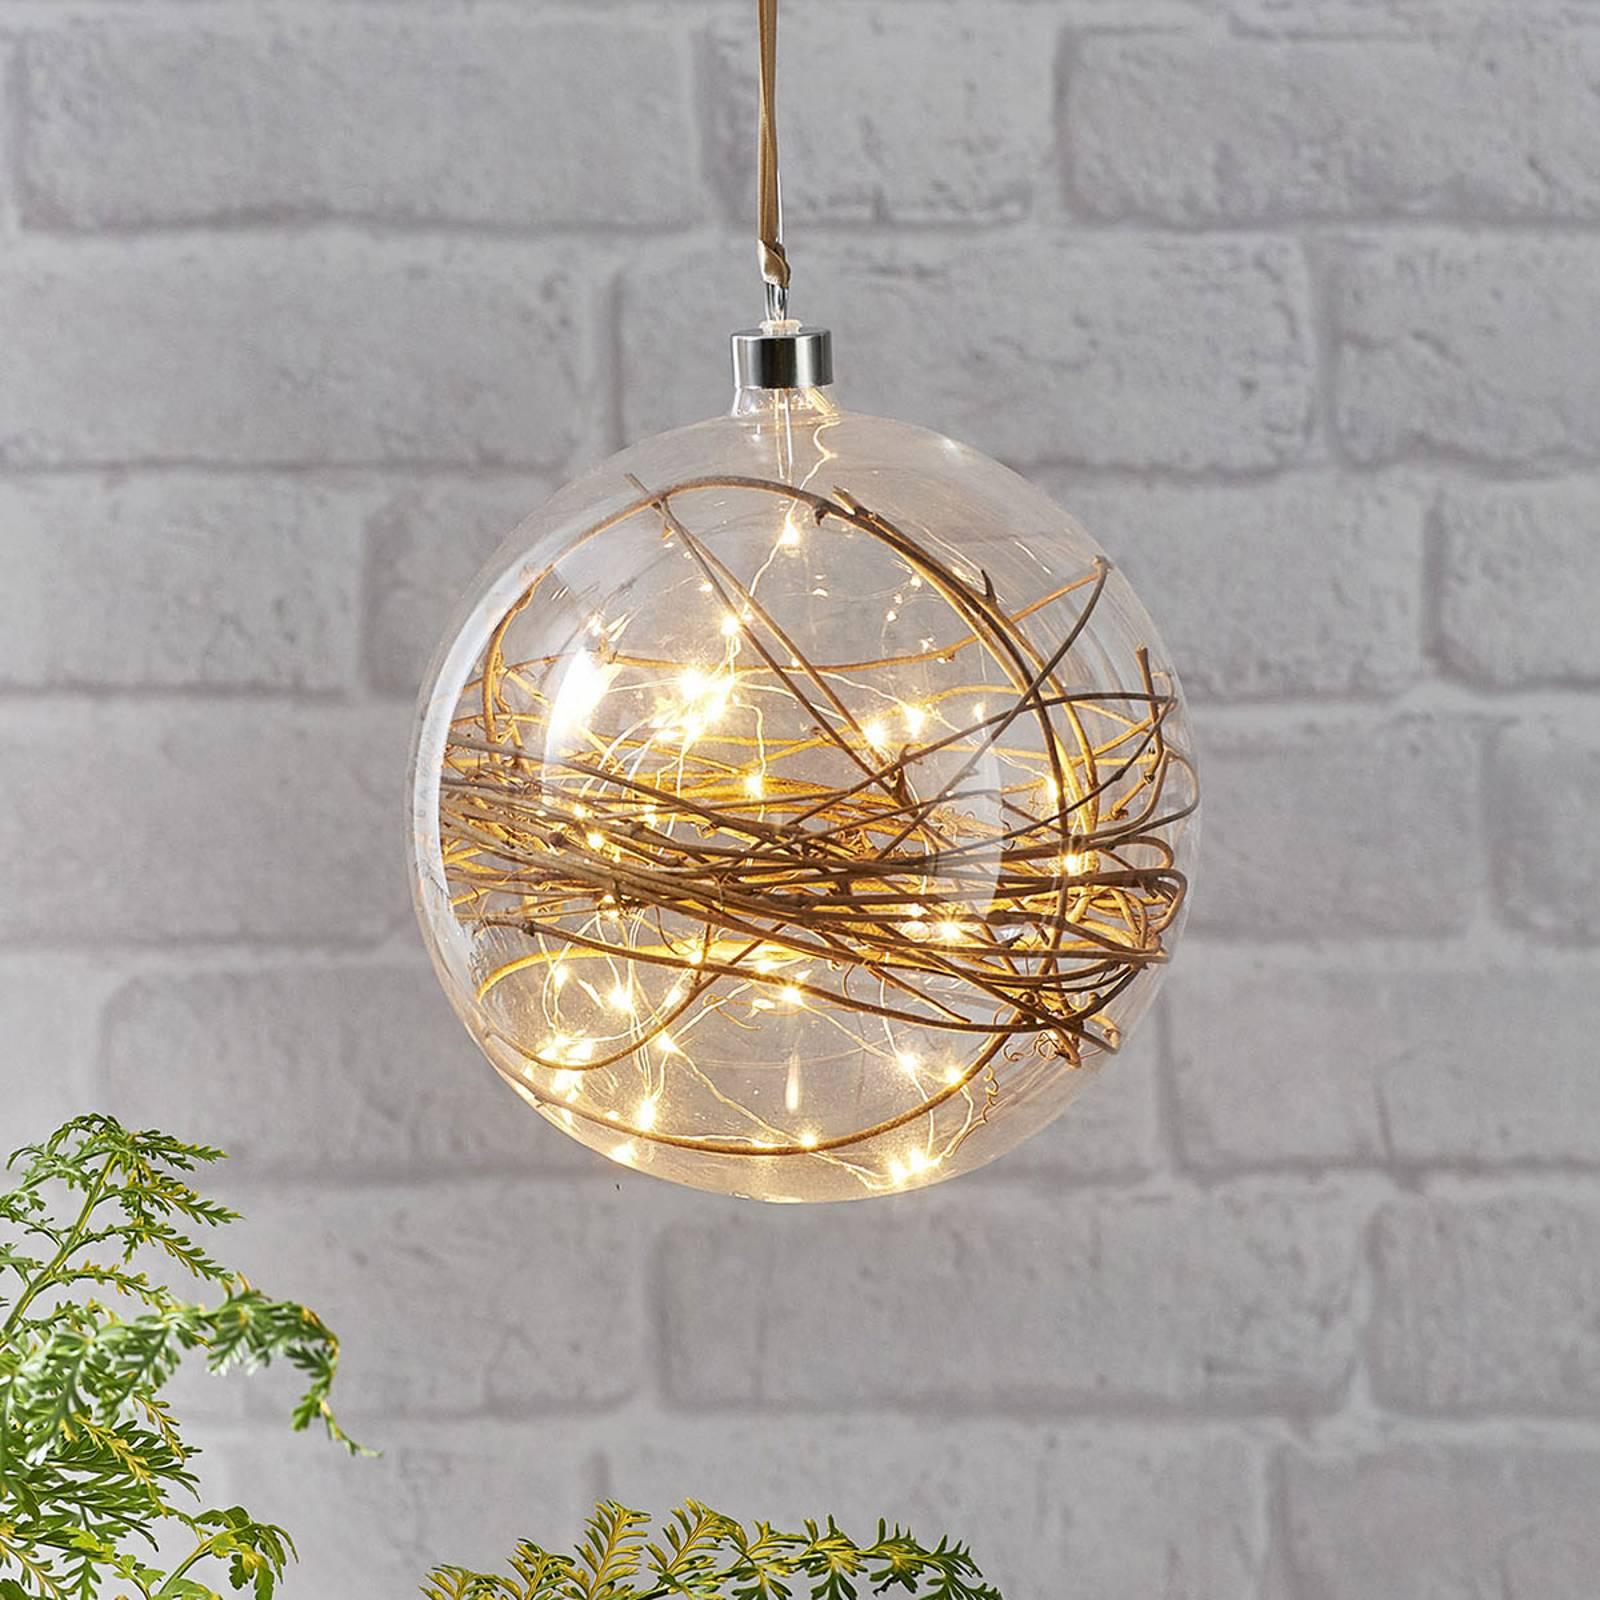 Glow-LED-koristepallo, kirkas, rottinki Ø 20 cm